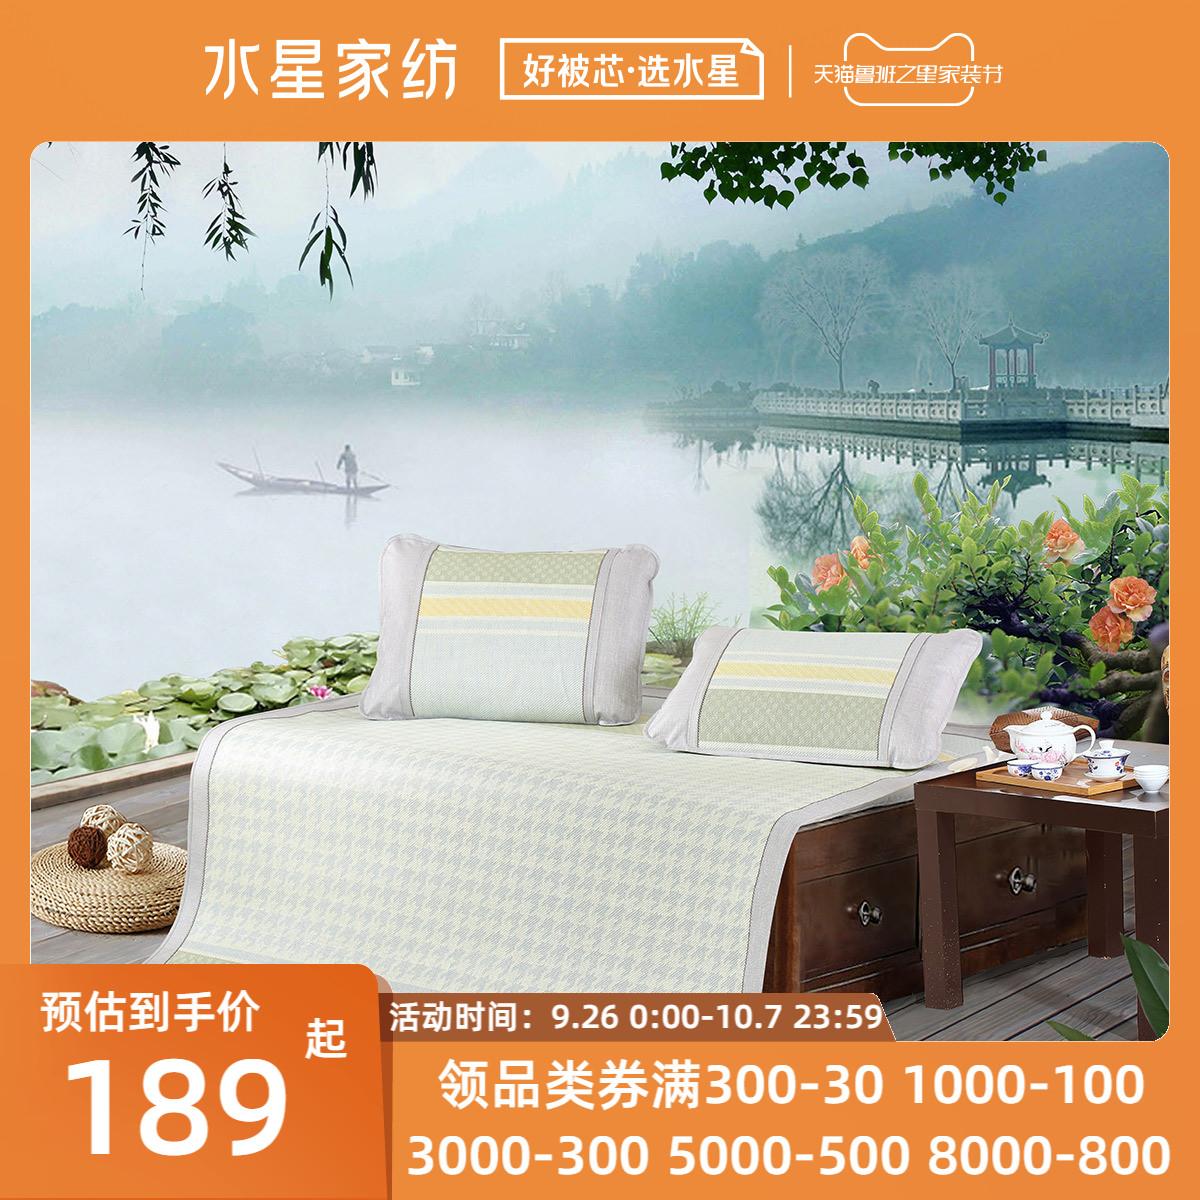 Декоративные одеяла и подушки / Прикроватные коврики Артикул 594930475623